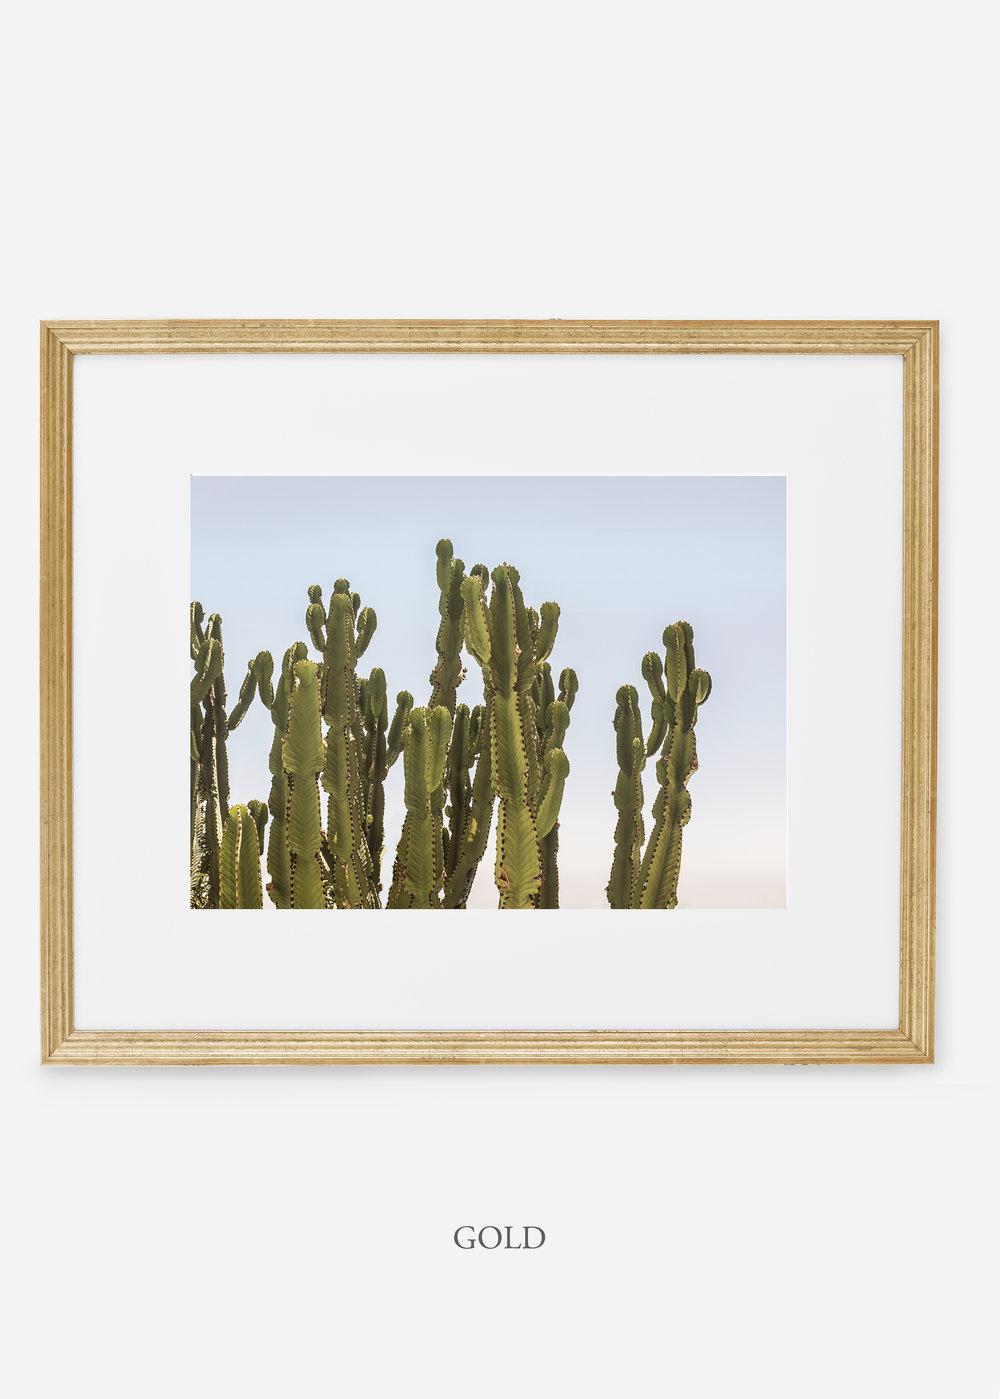 WilderCalifornia_goldframe_interiordesign_cactusprint_CaiforniaCactusNo.3.jpg